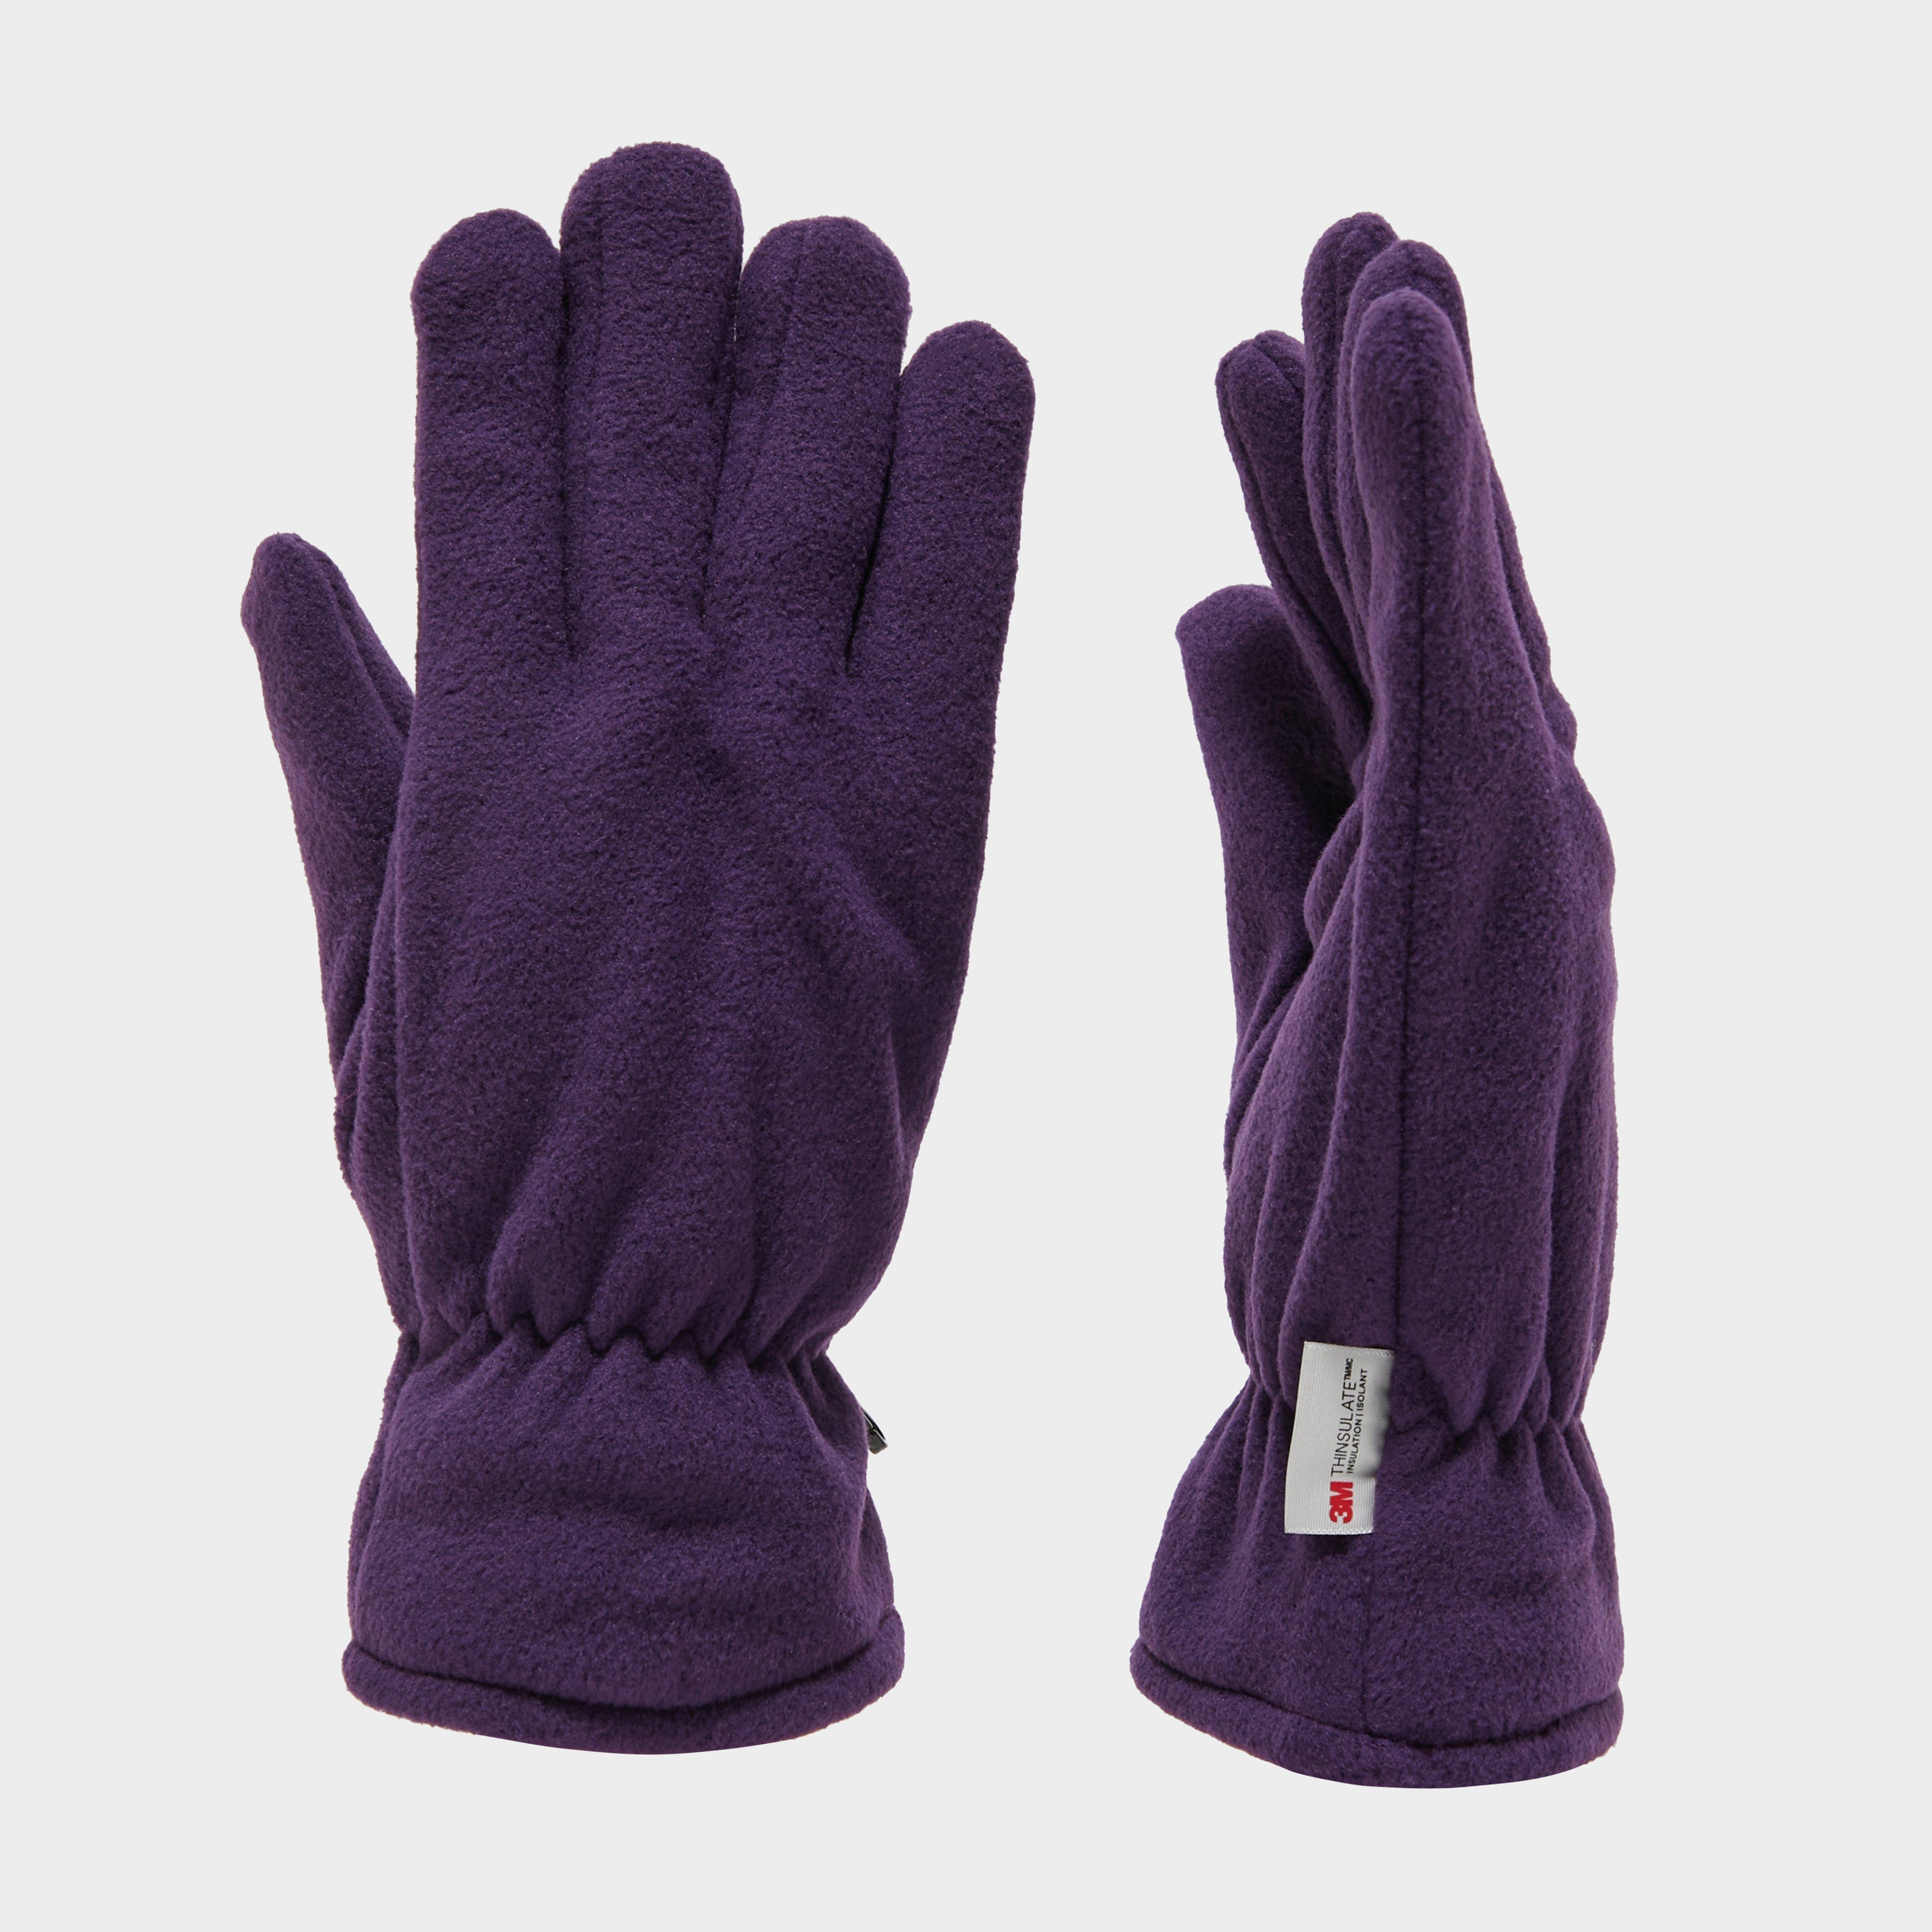 Peter Storm Unisex Thinsulate Fleece Gloves - Purple/purple  Purple/purple